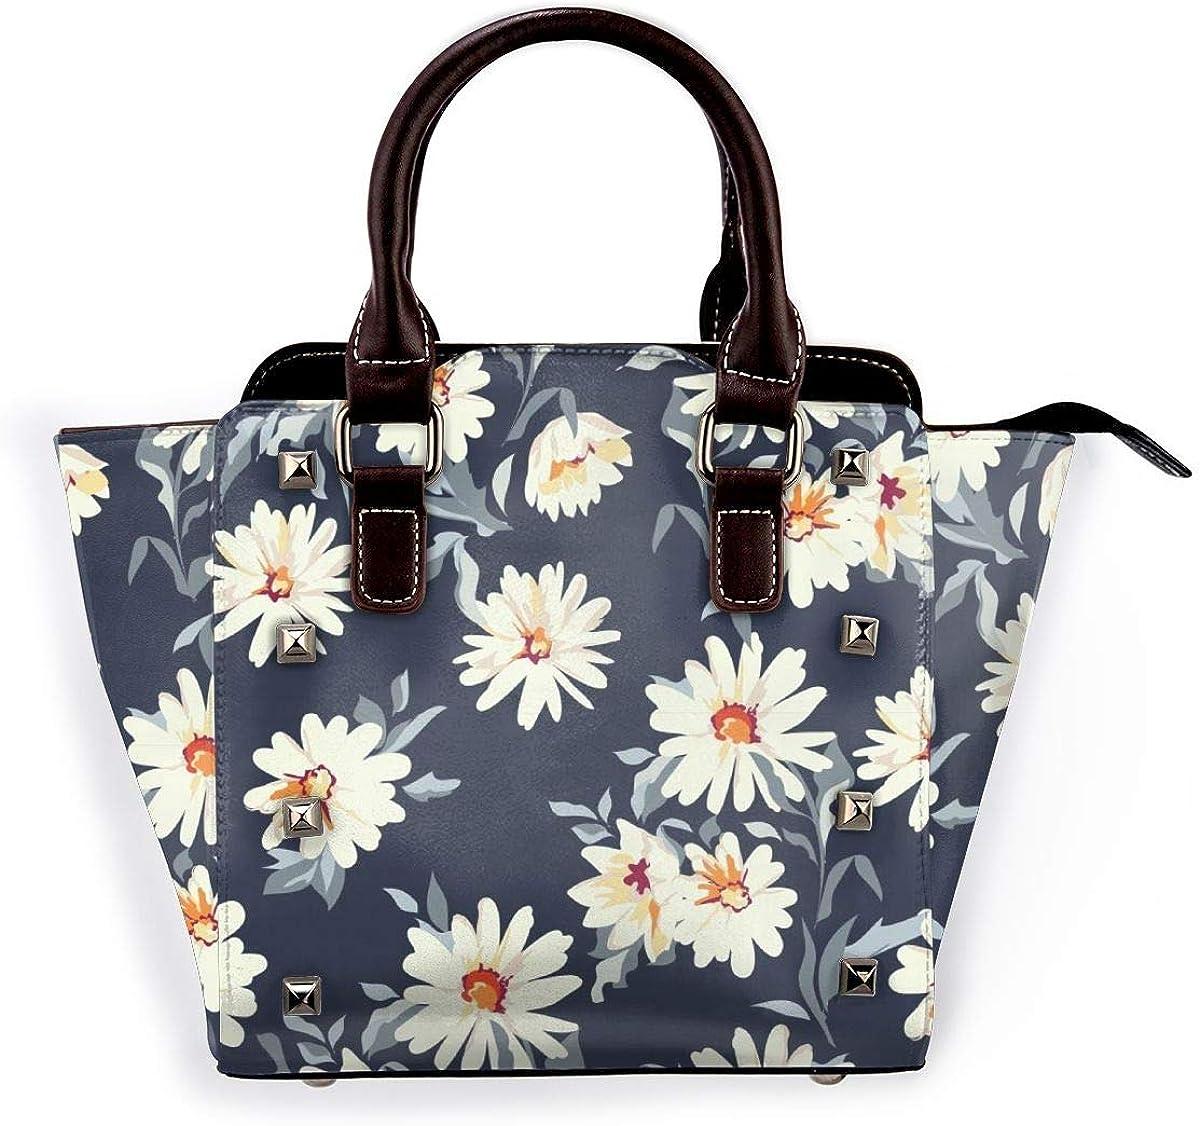 Blue Roses - Bolso de hombro para mujer, de piel auténtica, con remaches Flores Blancas